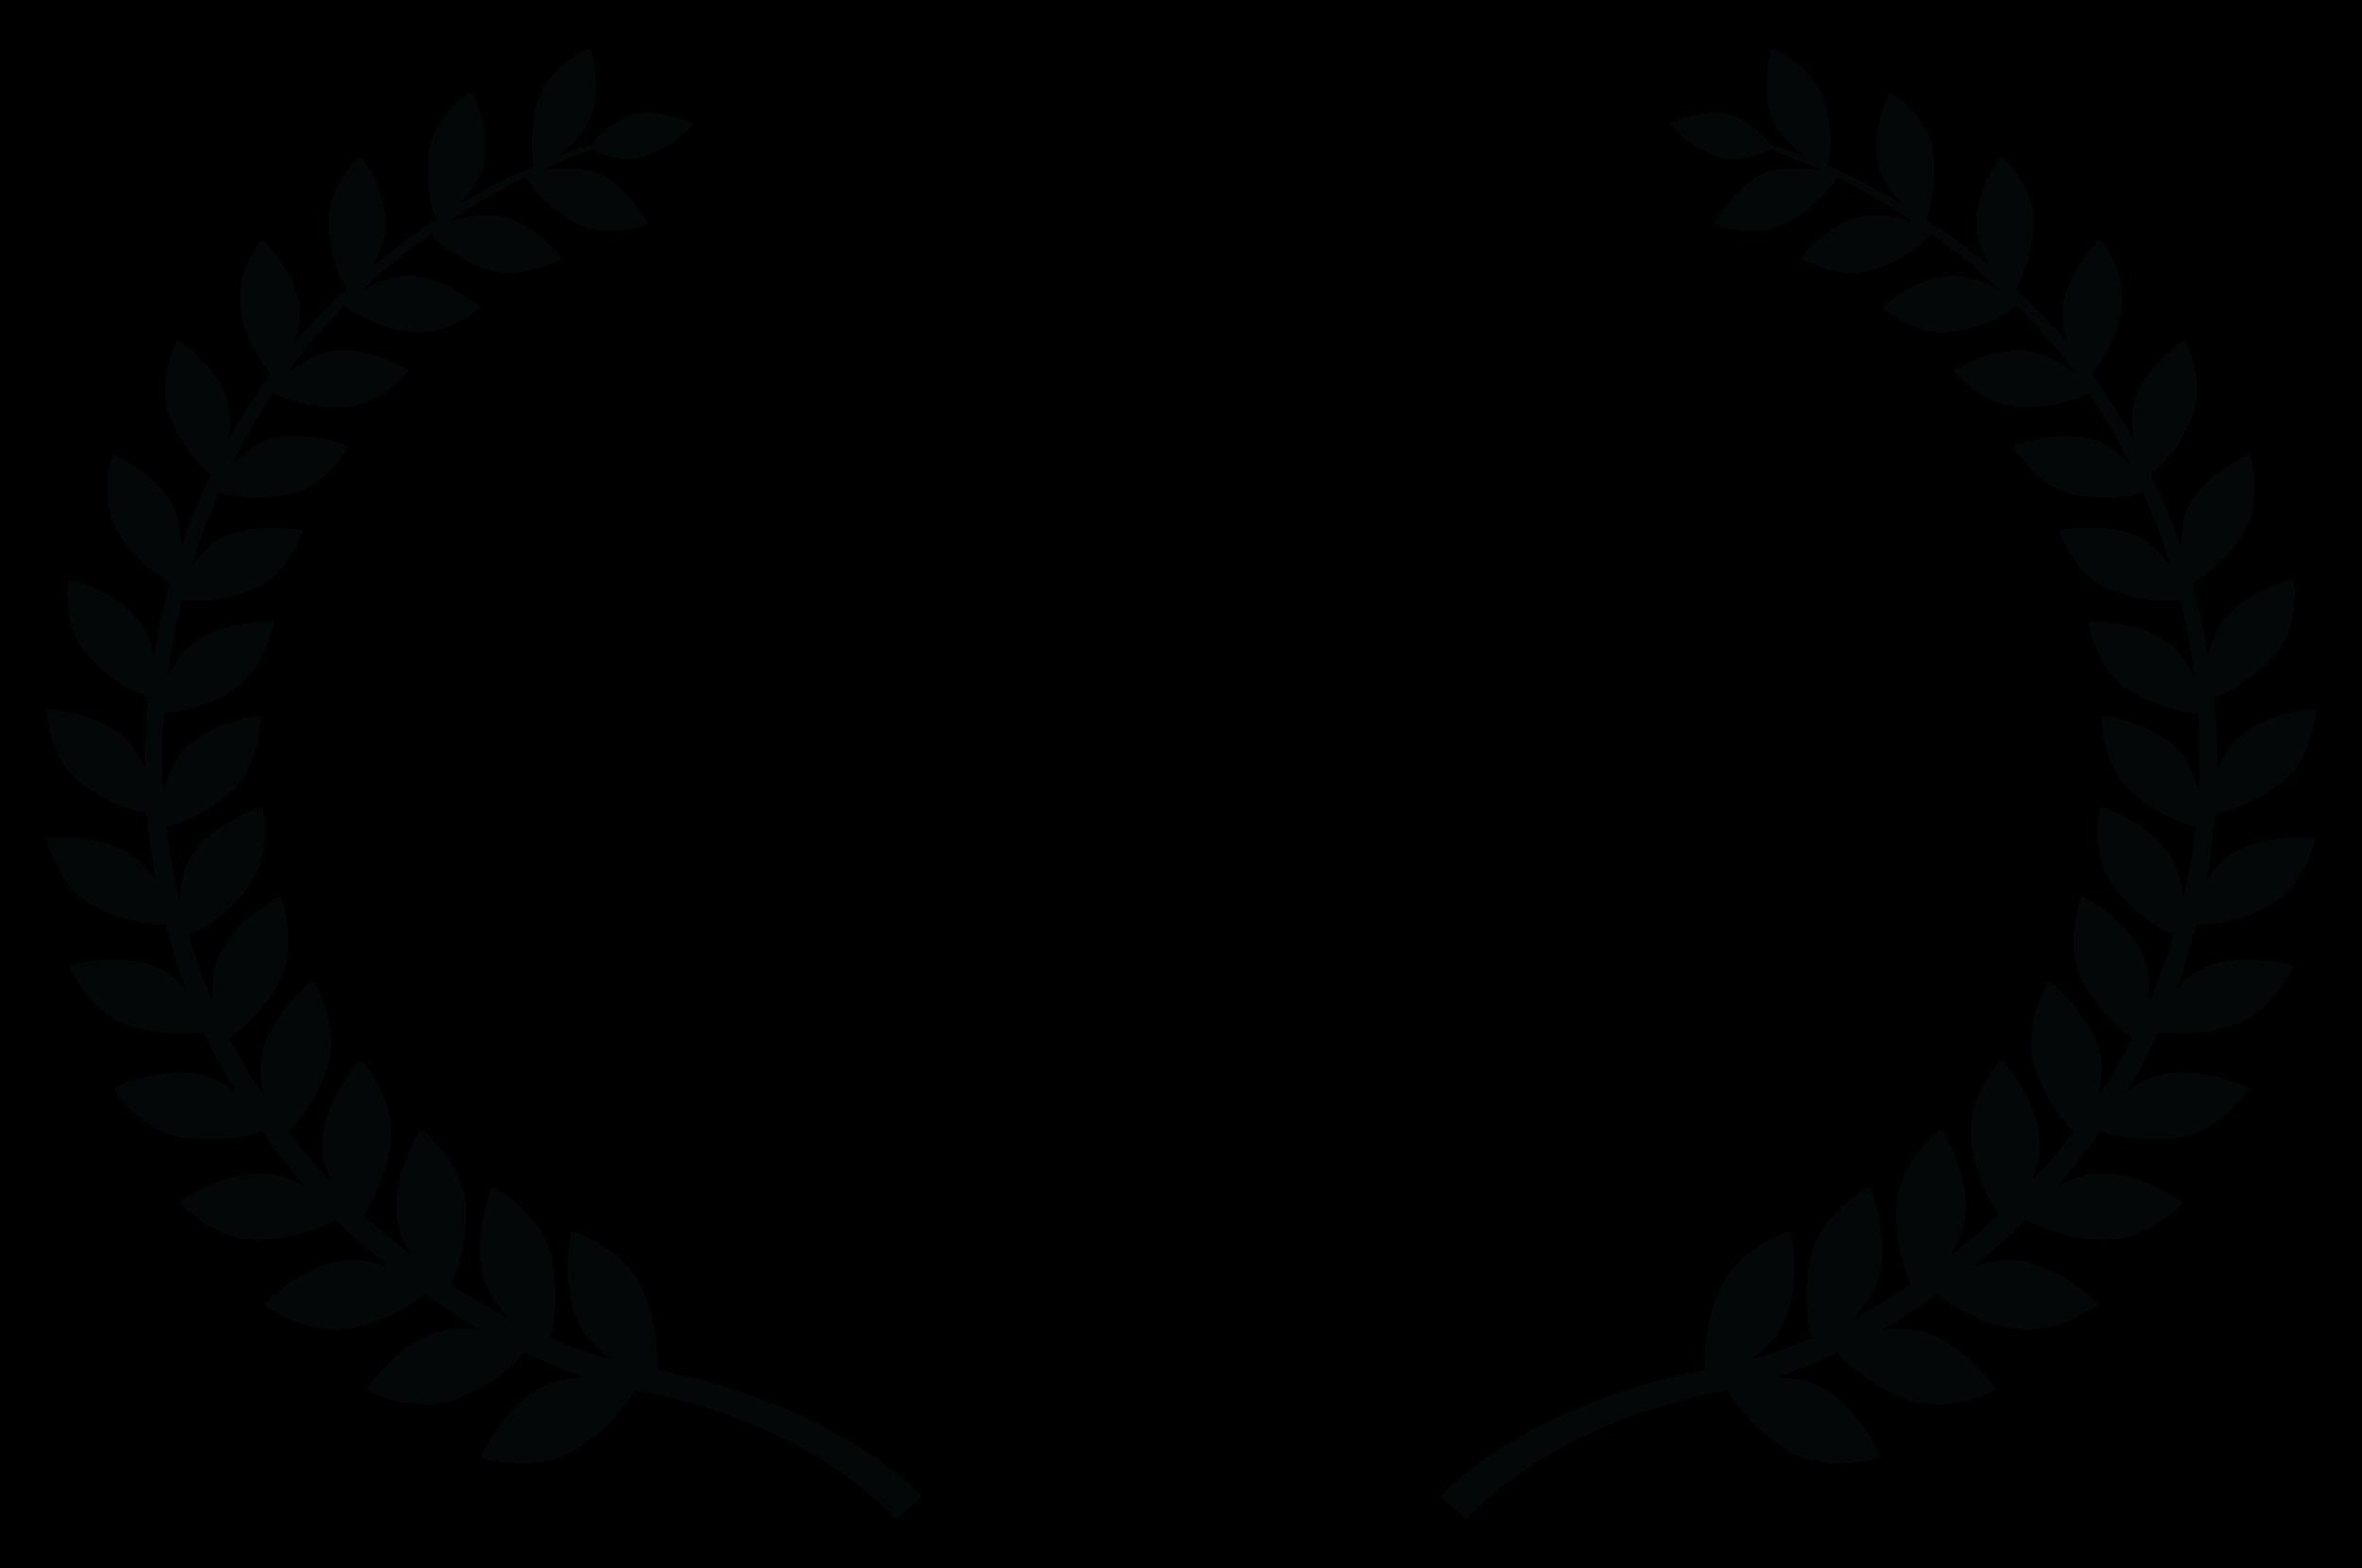 OFFICIALSELECTION-PortlandEcoFilmFestival-2017.png